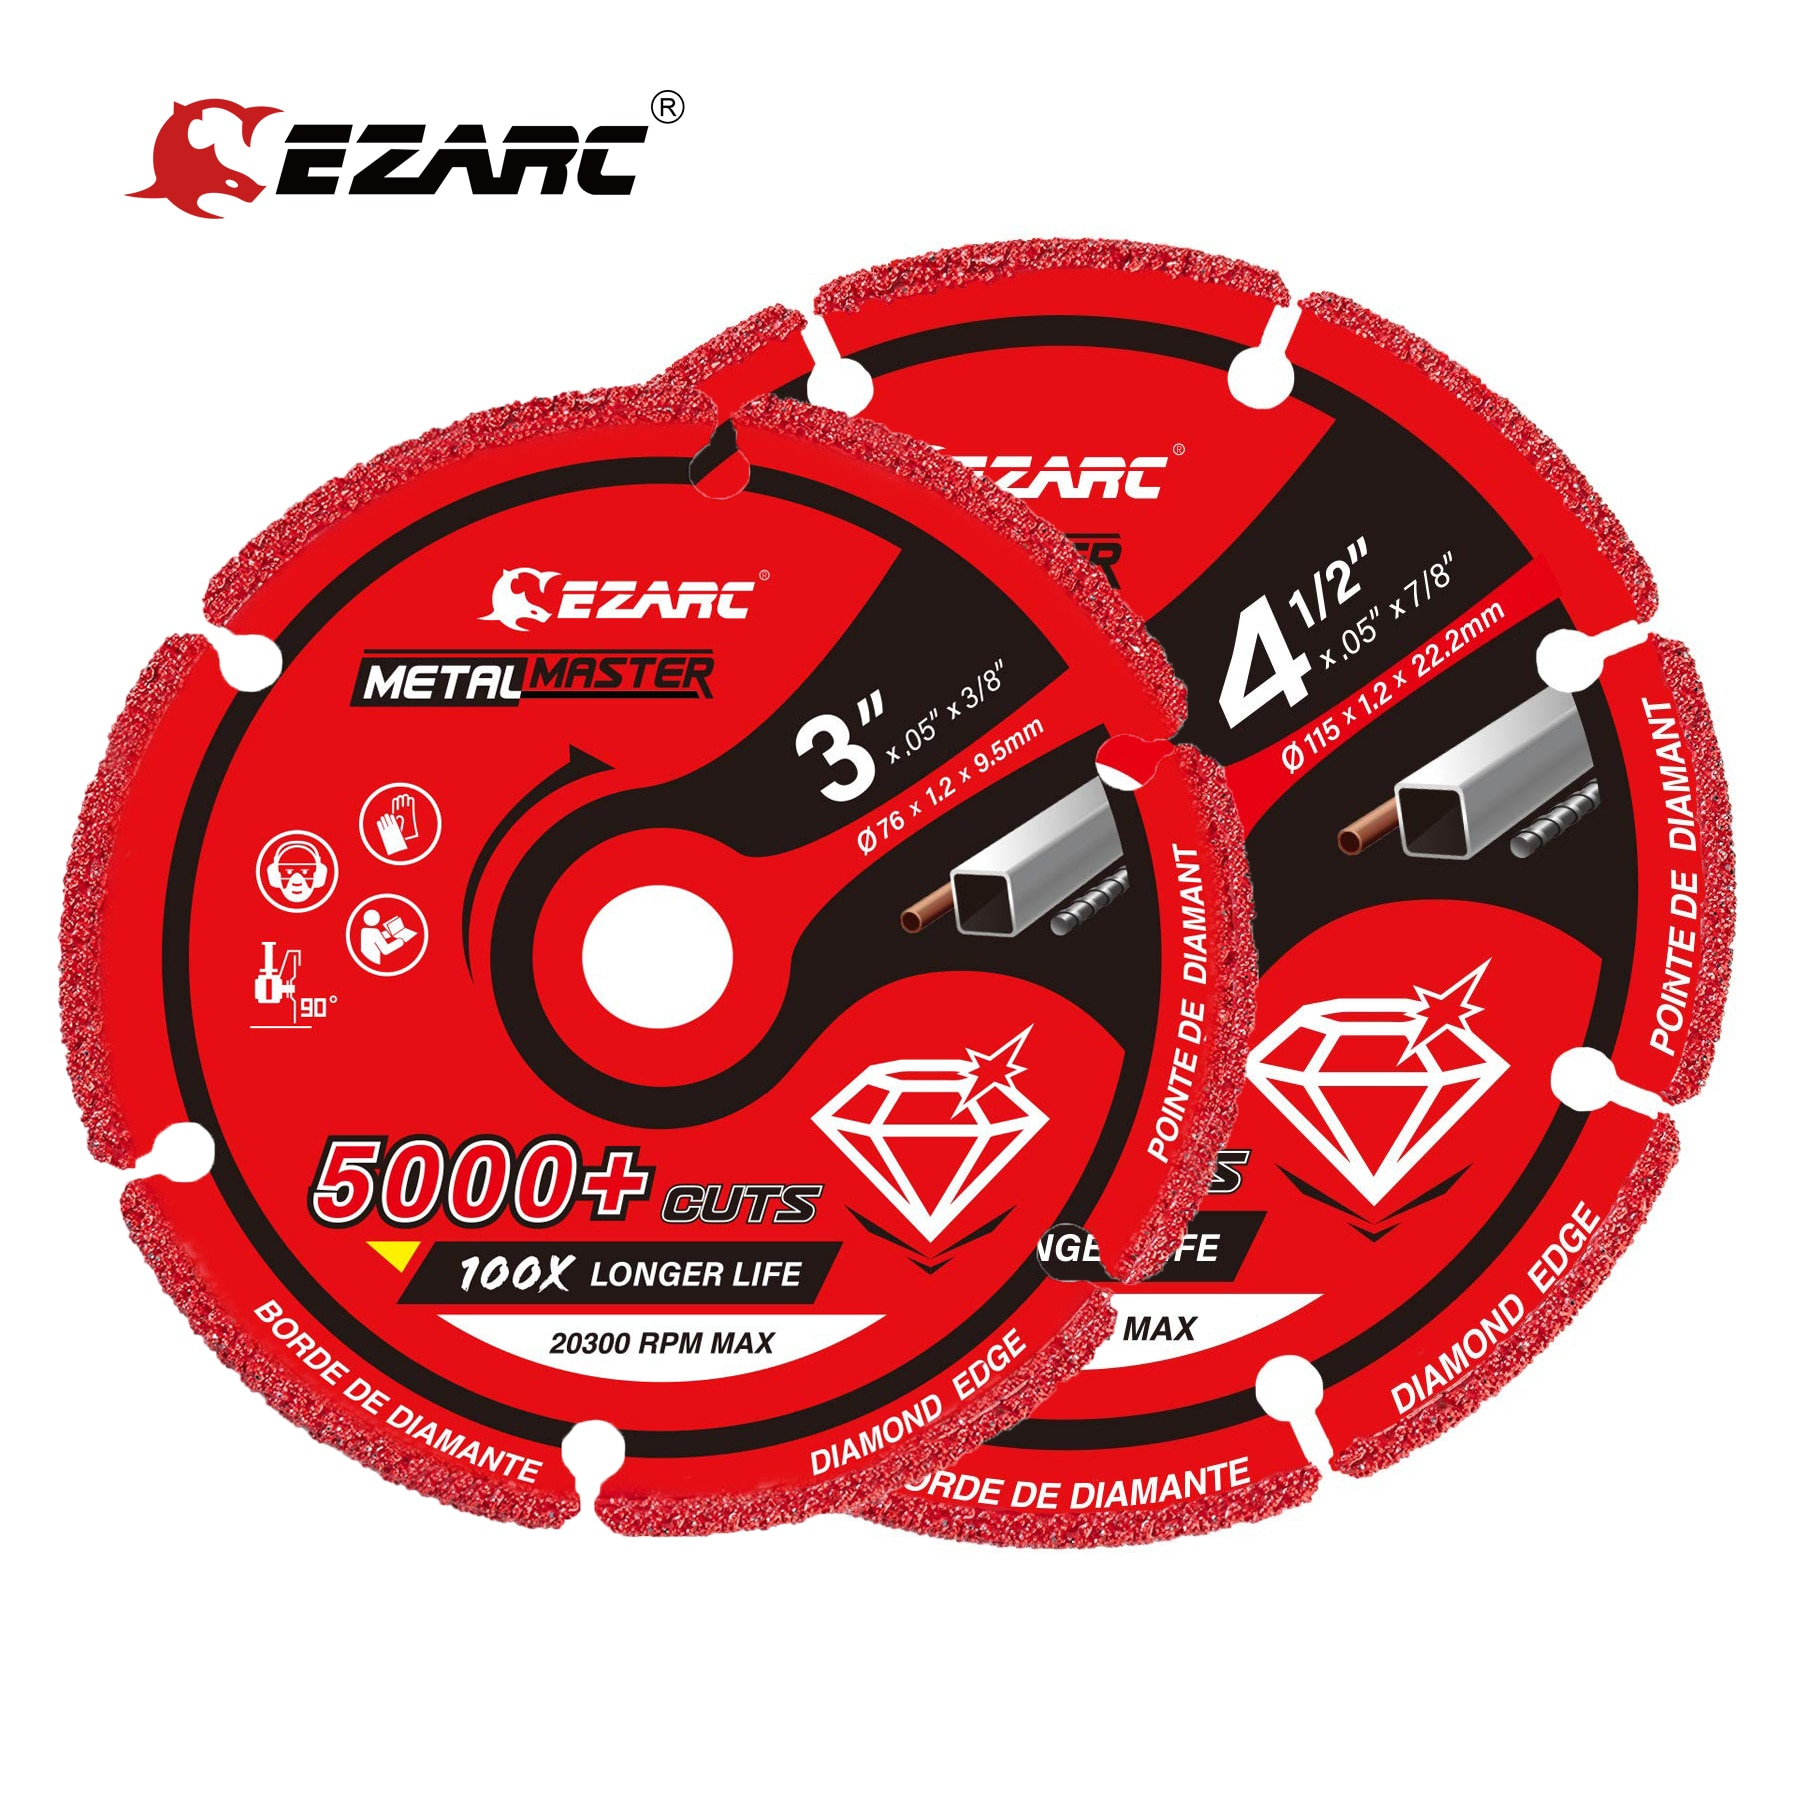 EZARC Diamond Cutting Wheel 3 x 3/8 Inch & 4-1/2 x 7/8 Inch for Metal,Cut Off Wheel with 5000+ Cuts on Rebar,Steel,Iron and INOX